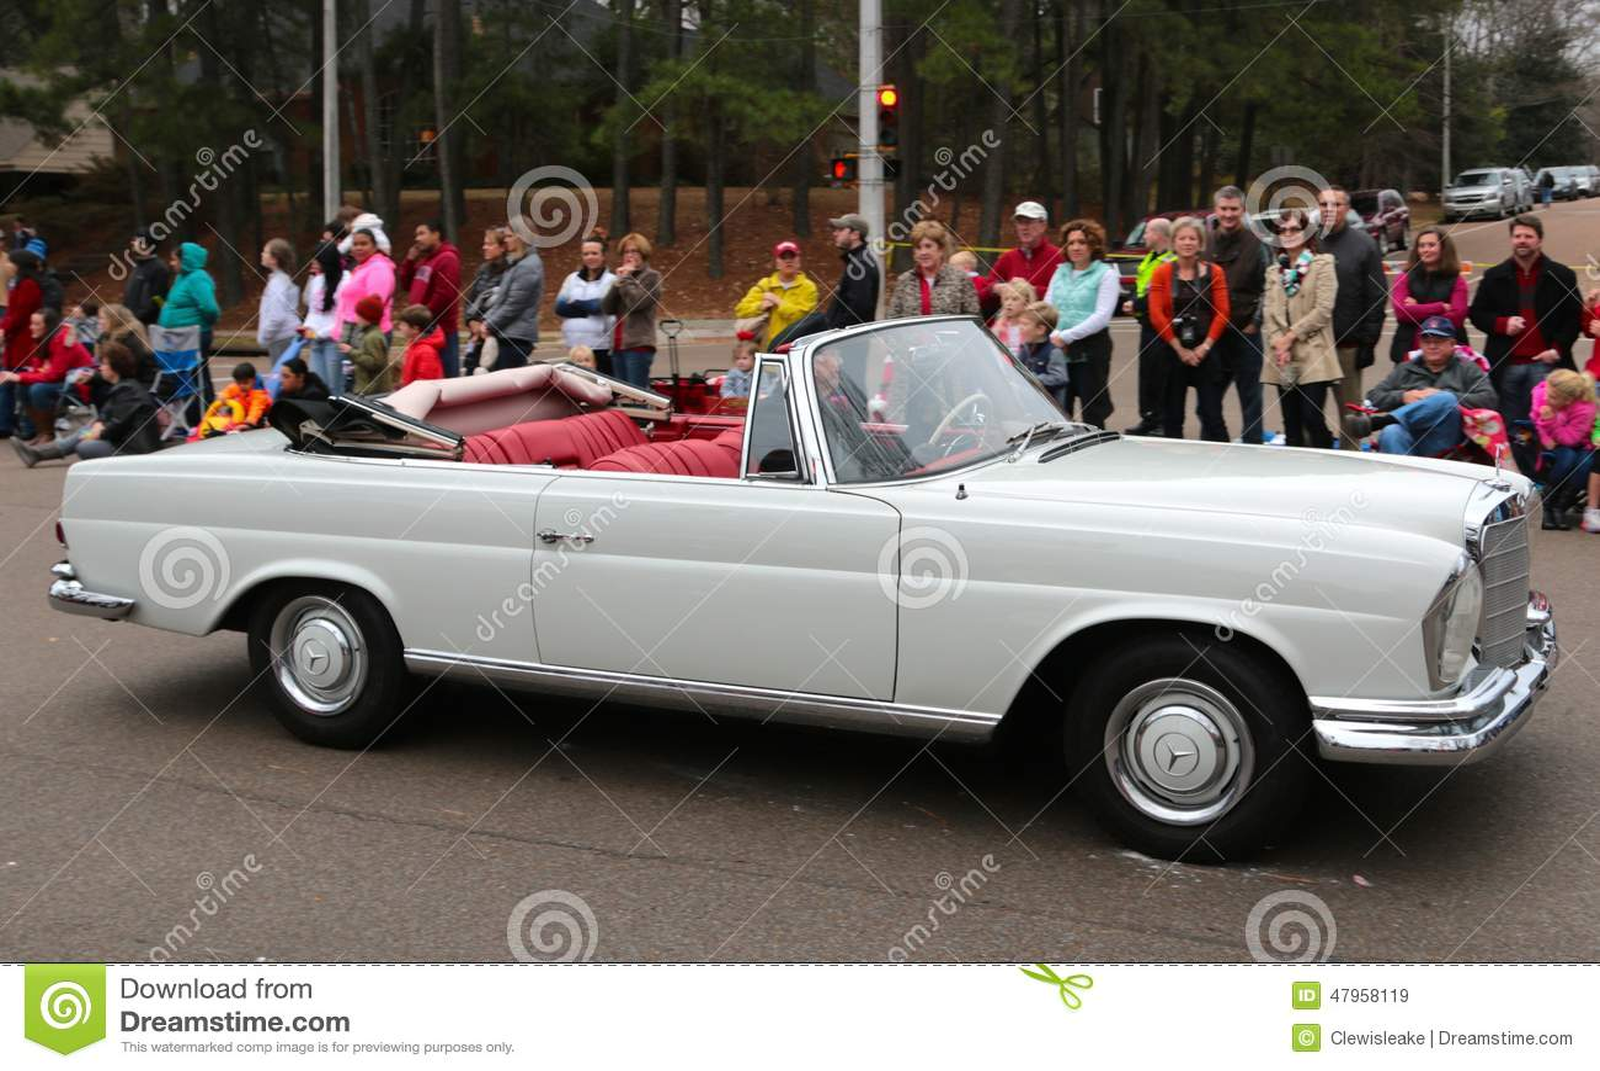 Mercedes Christmas Parade 2019 Mercedes Benz Convertible Automobile Editorial Stock Image   Image